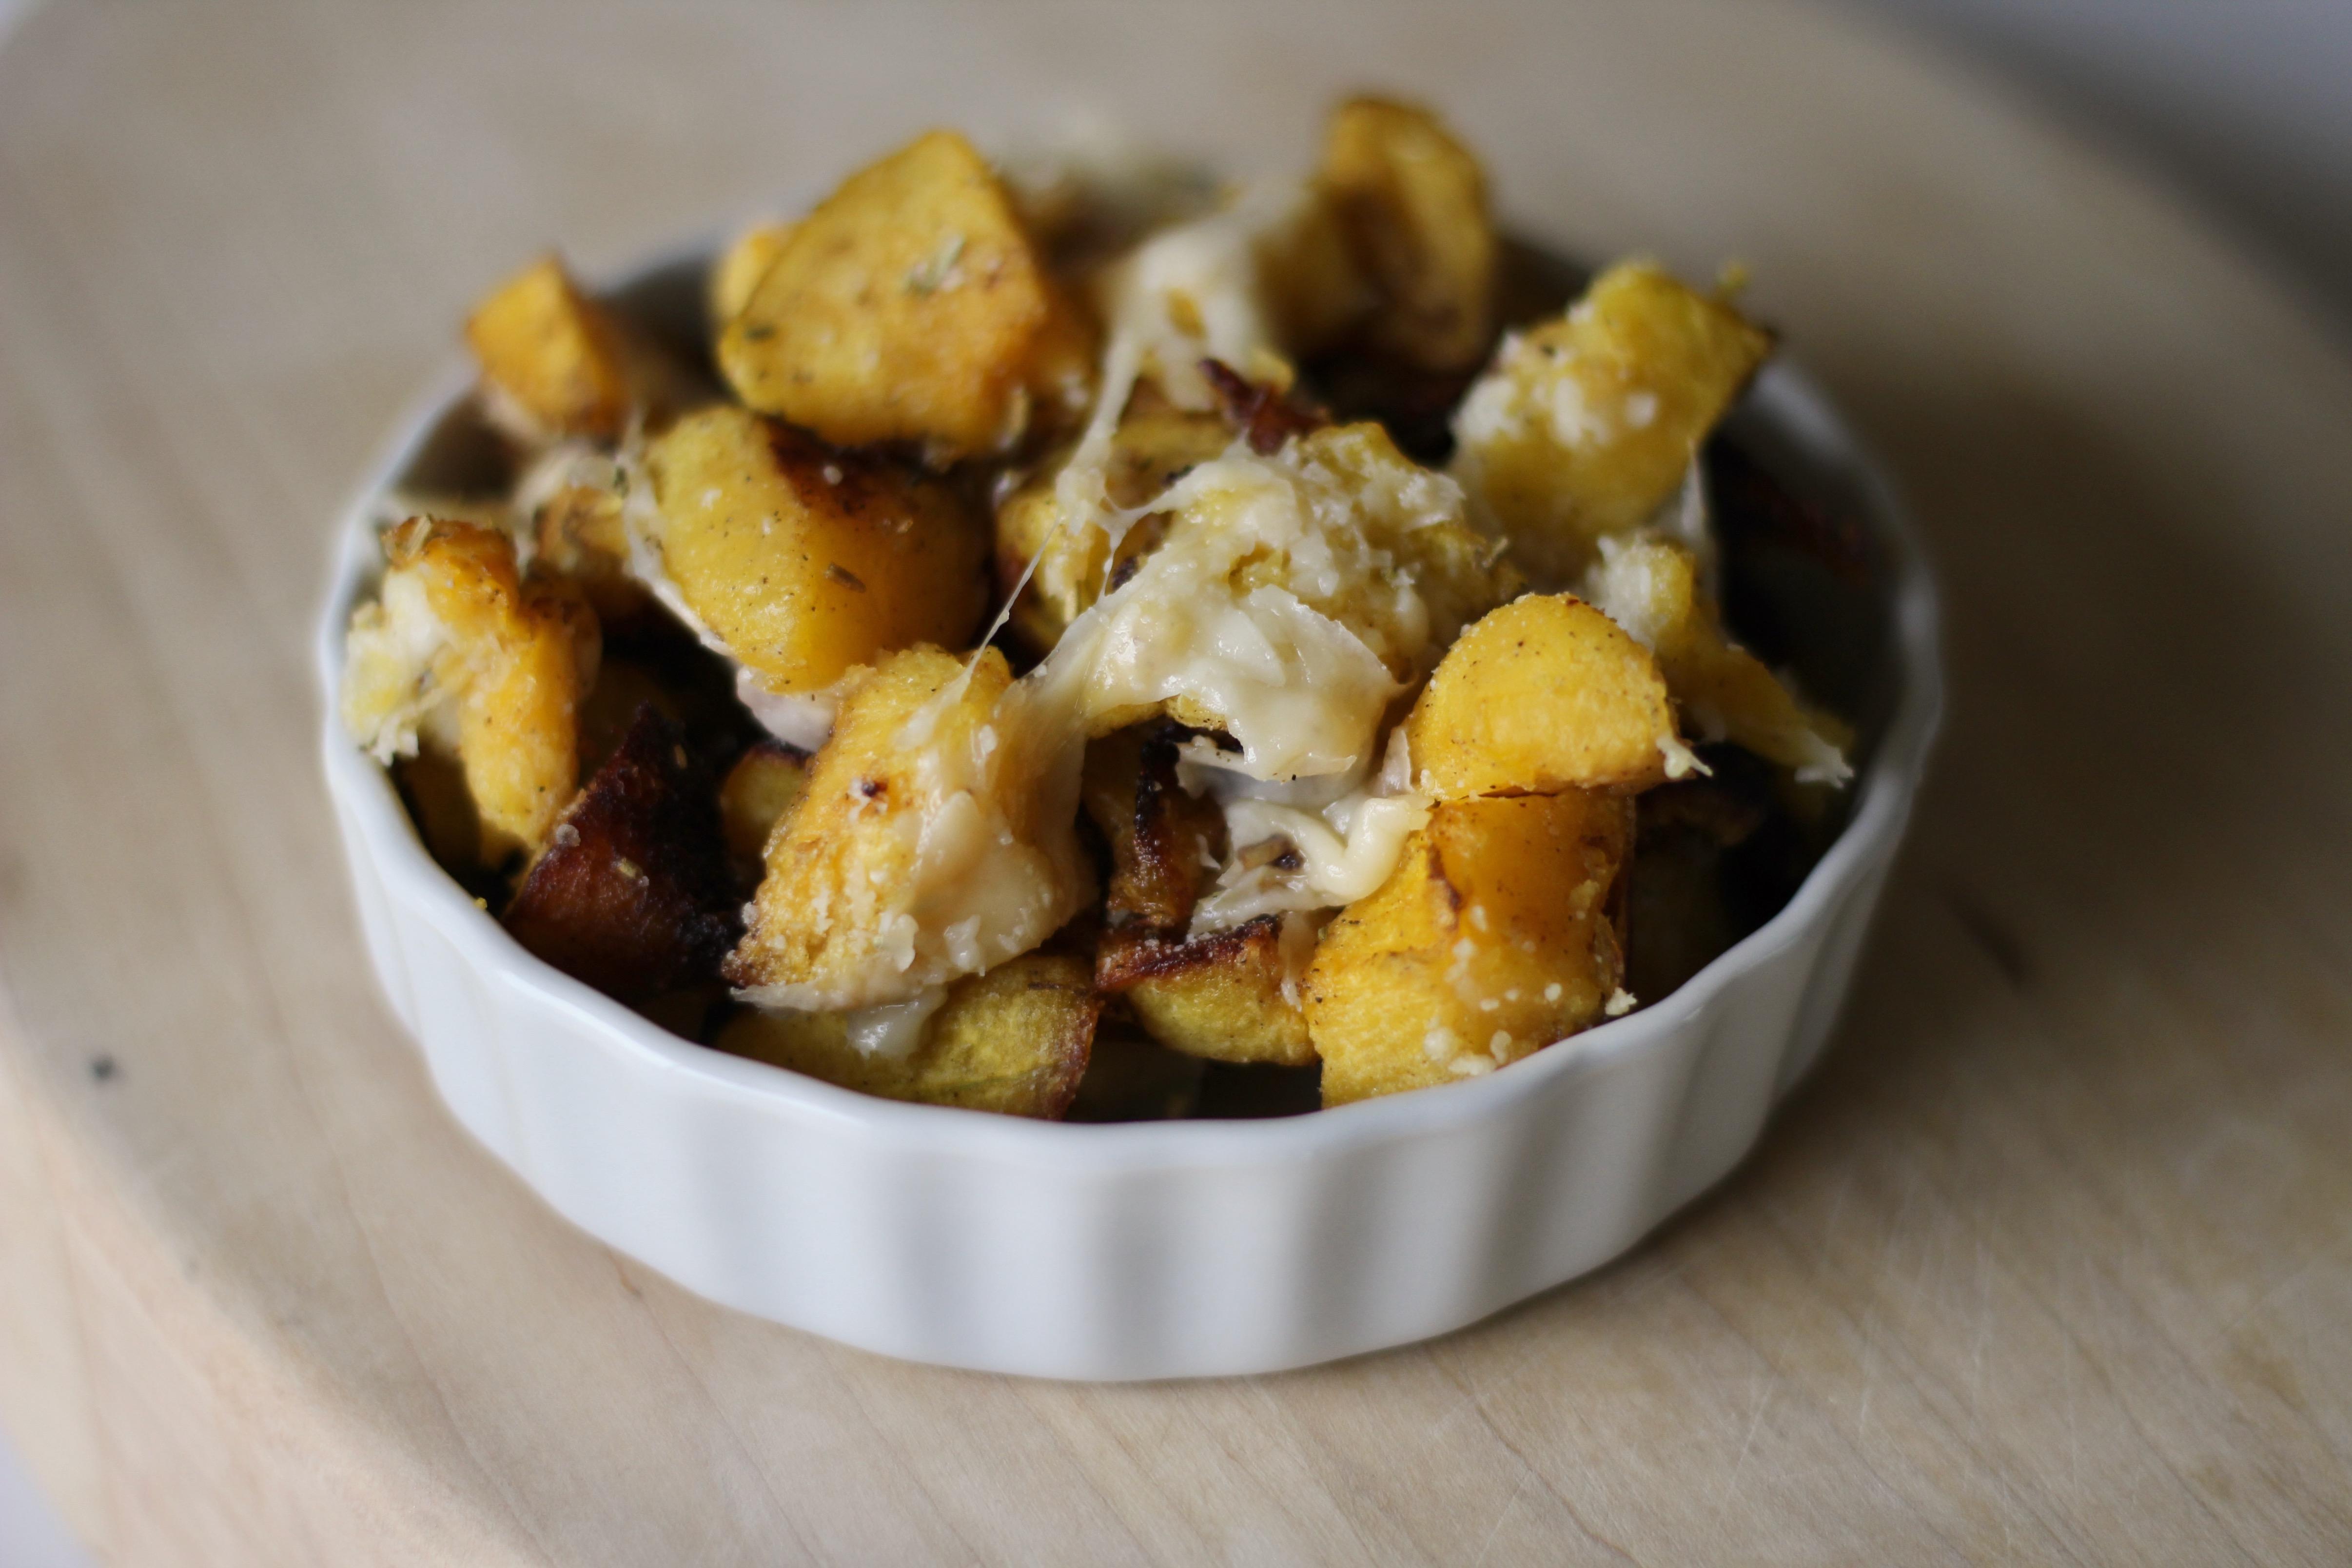 Roasted Acorn Squash with Parmesan SunnyDaysNora